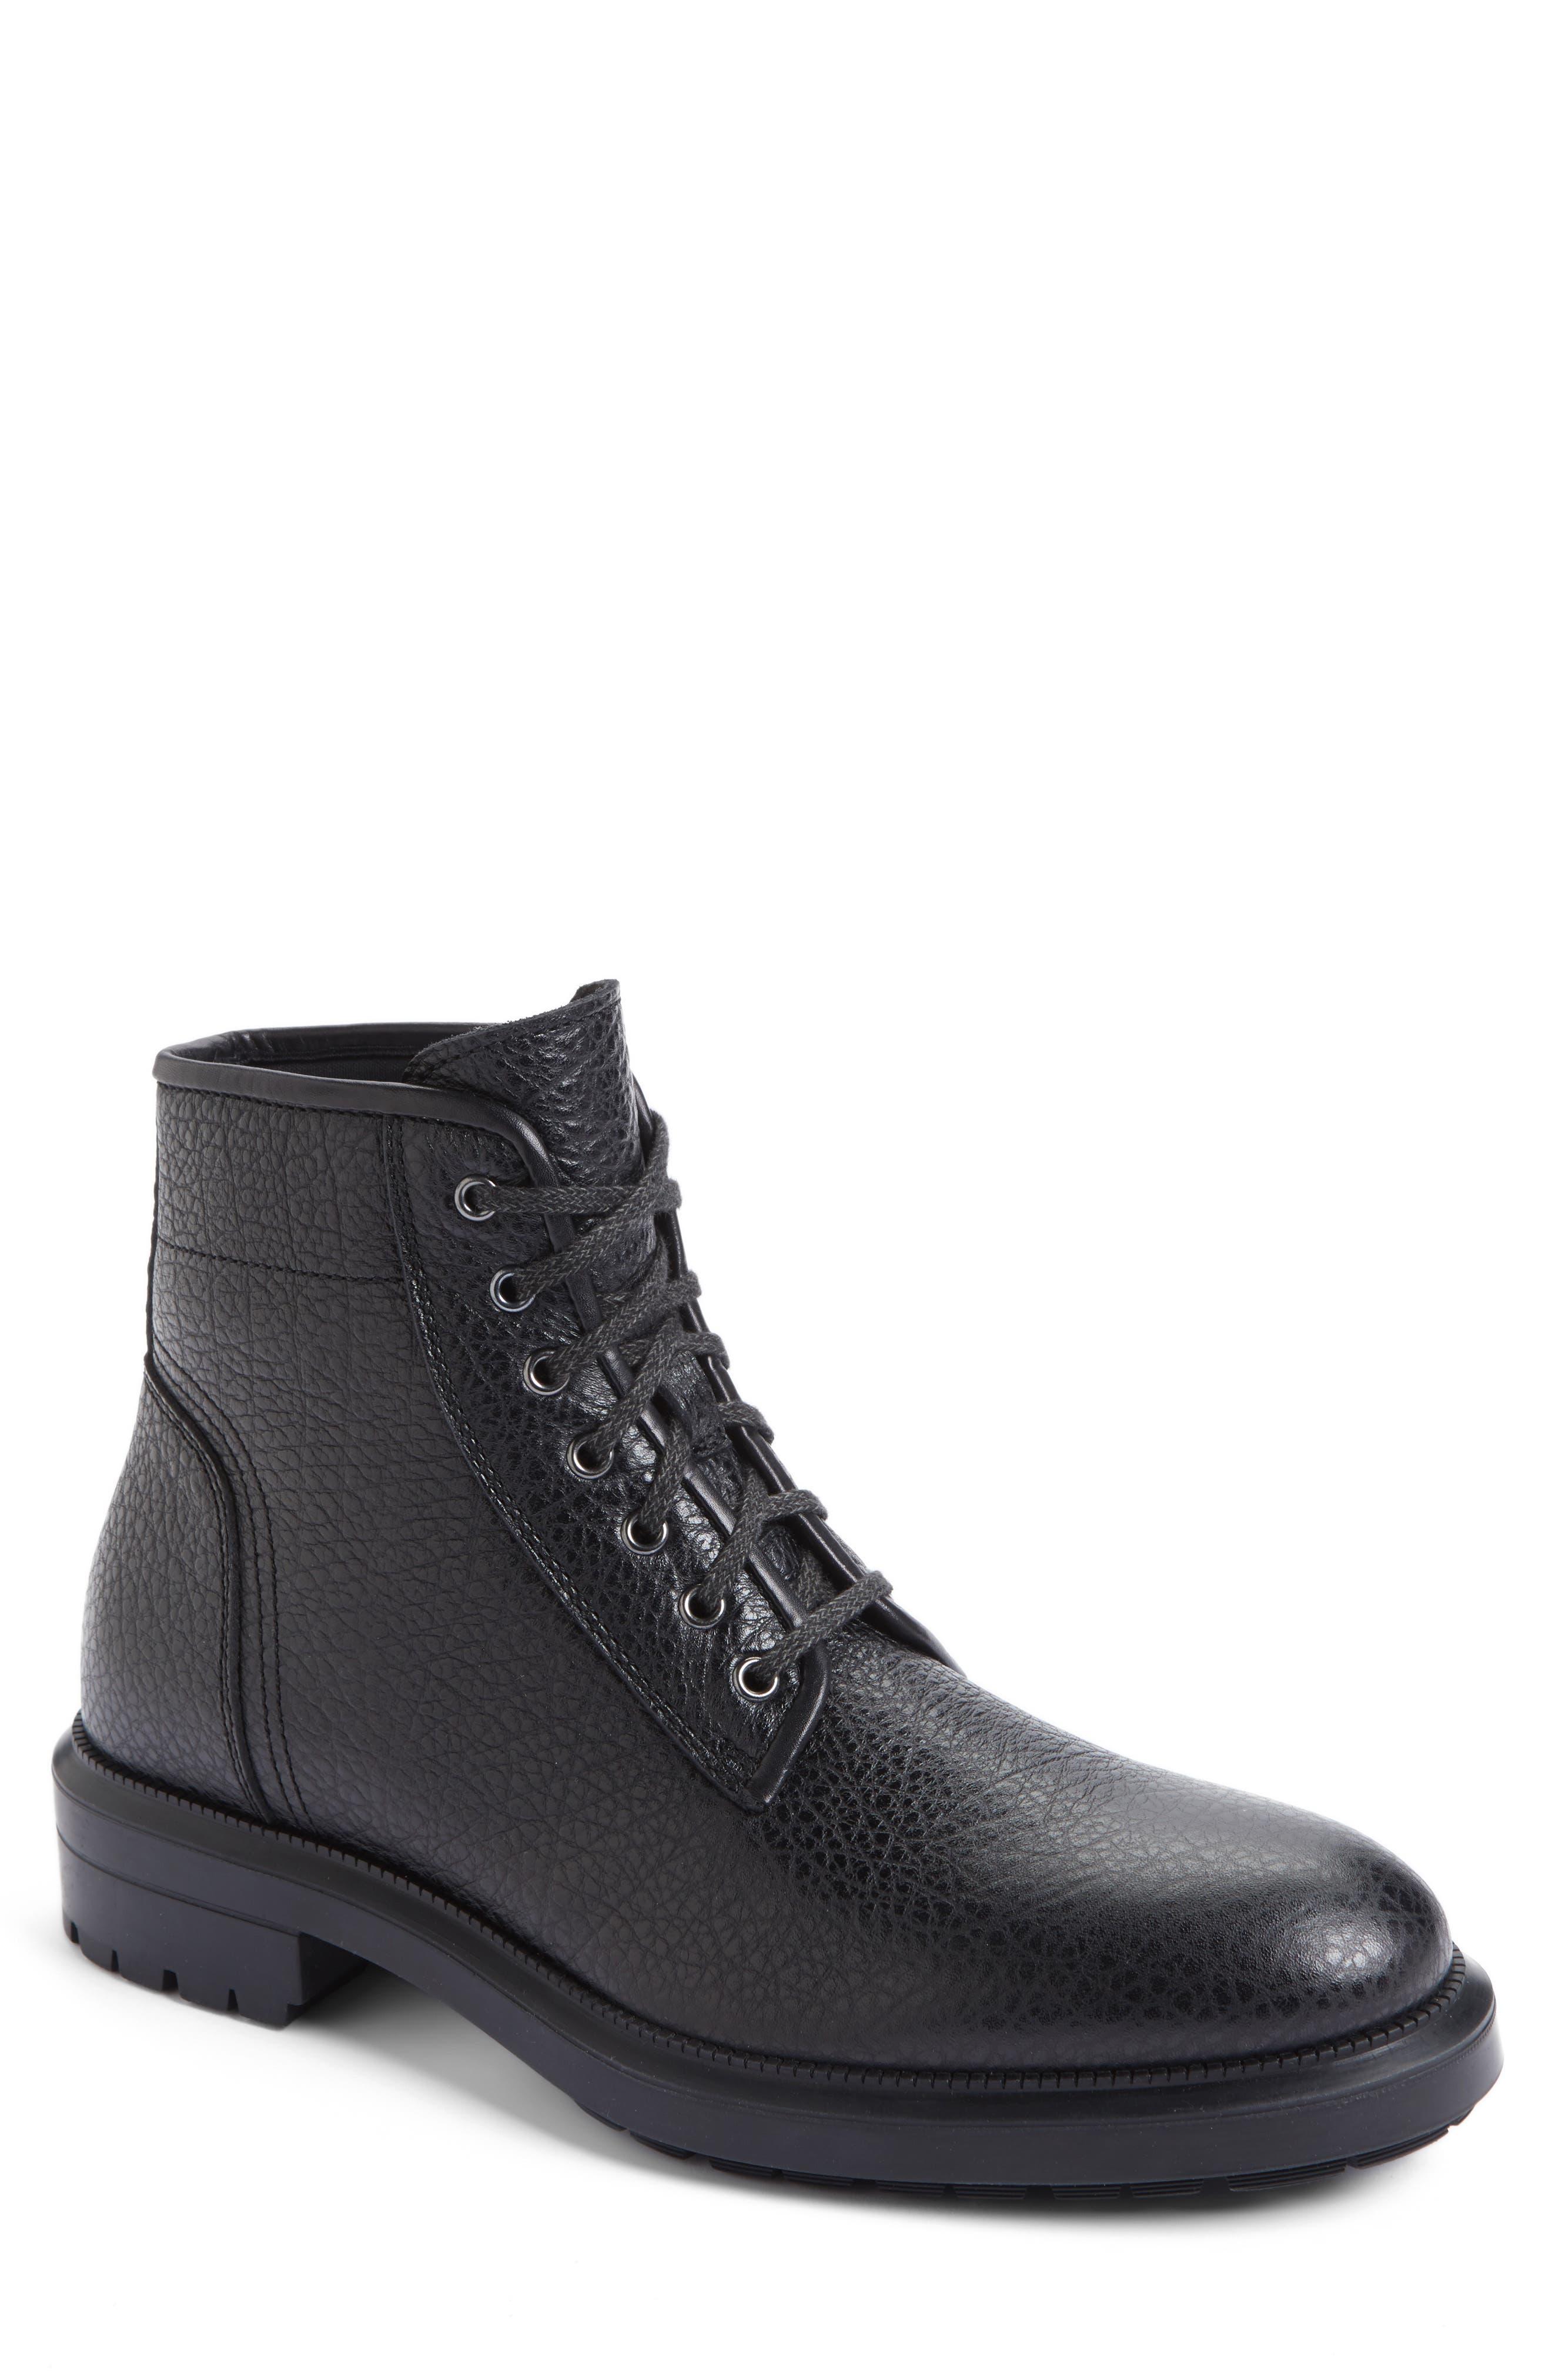 Aquatalia Tyson Plain Toe Boot (Men)